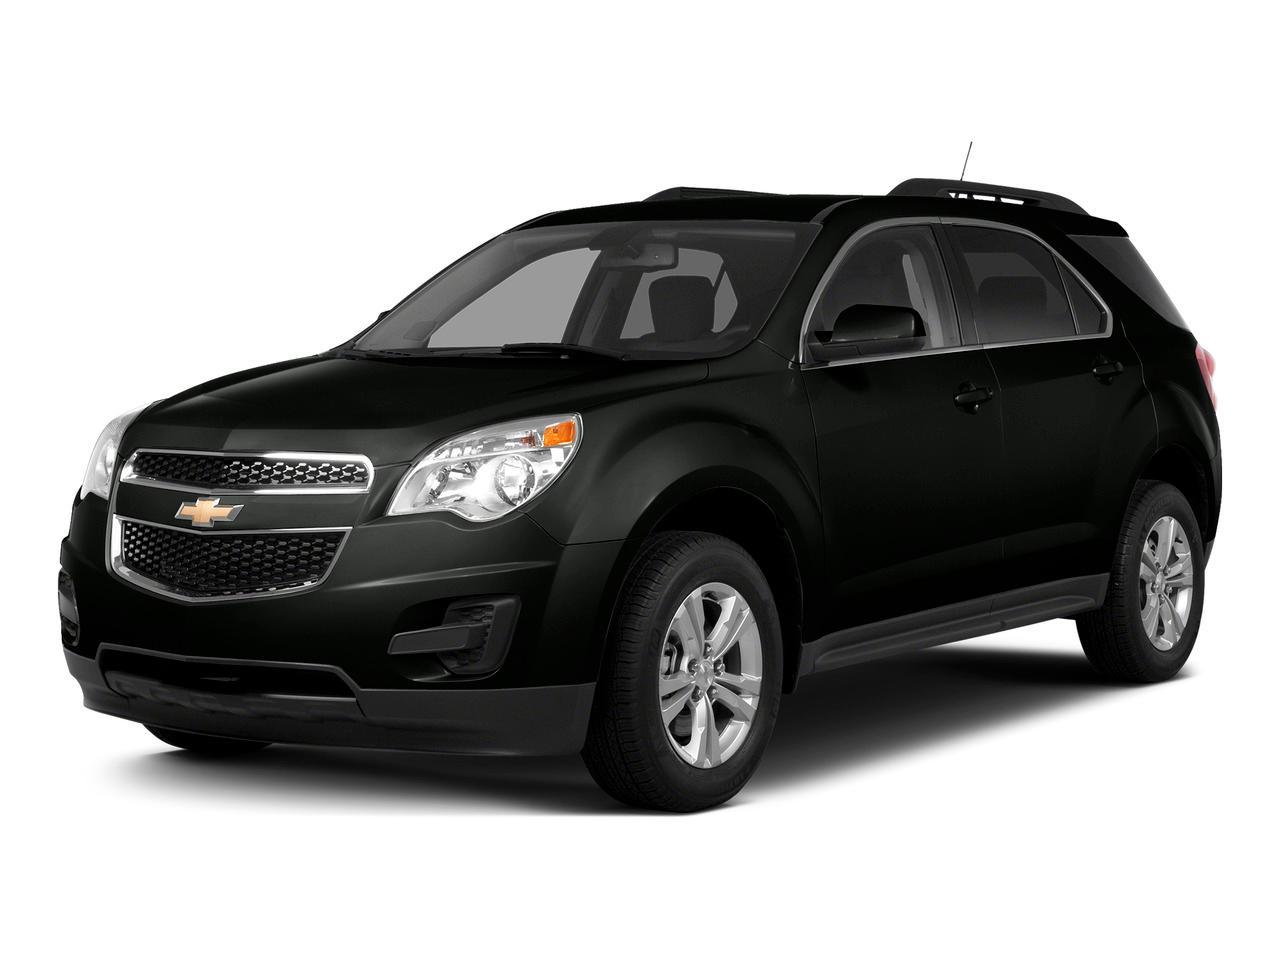 2015 Chevrolet Equinox Vehicle Photo in NORWICH, NY 13815-1747